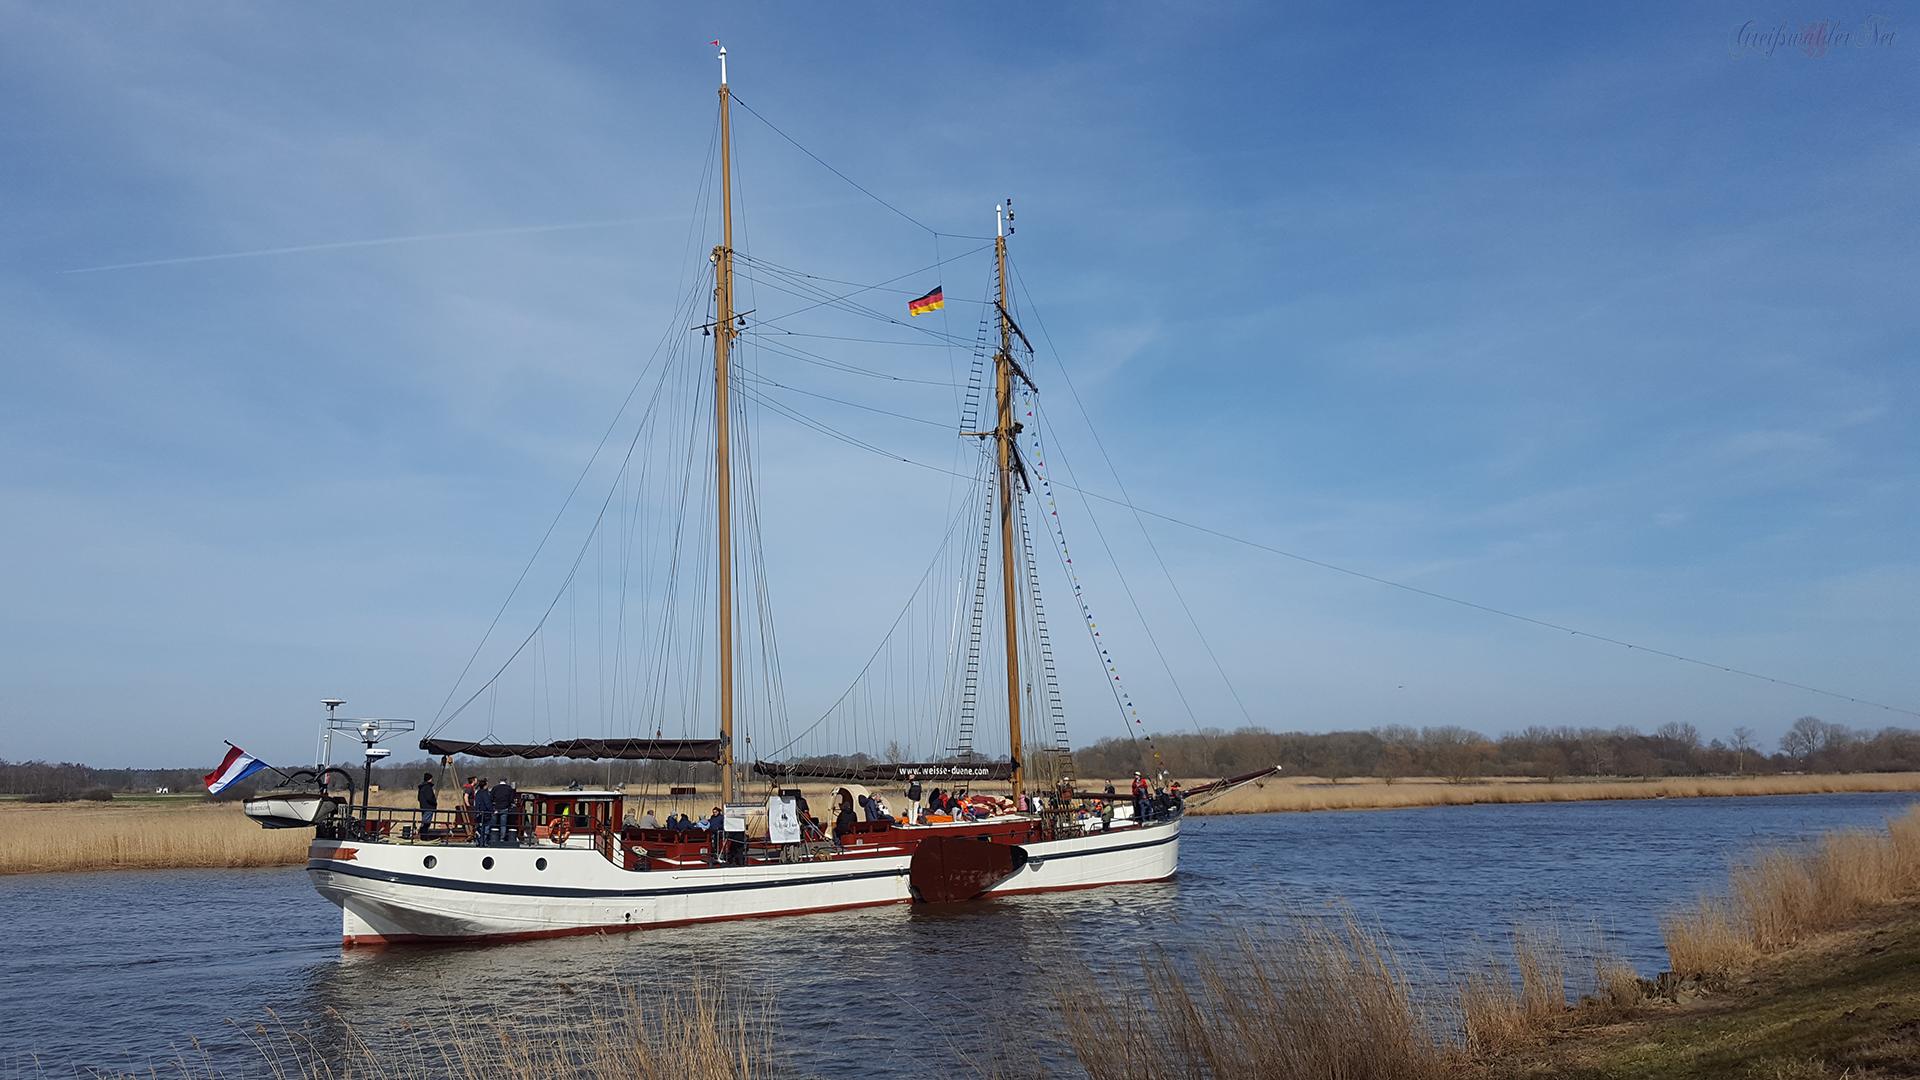 Ryck-Treideltour 2018 in Greifswald